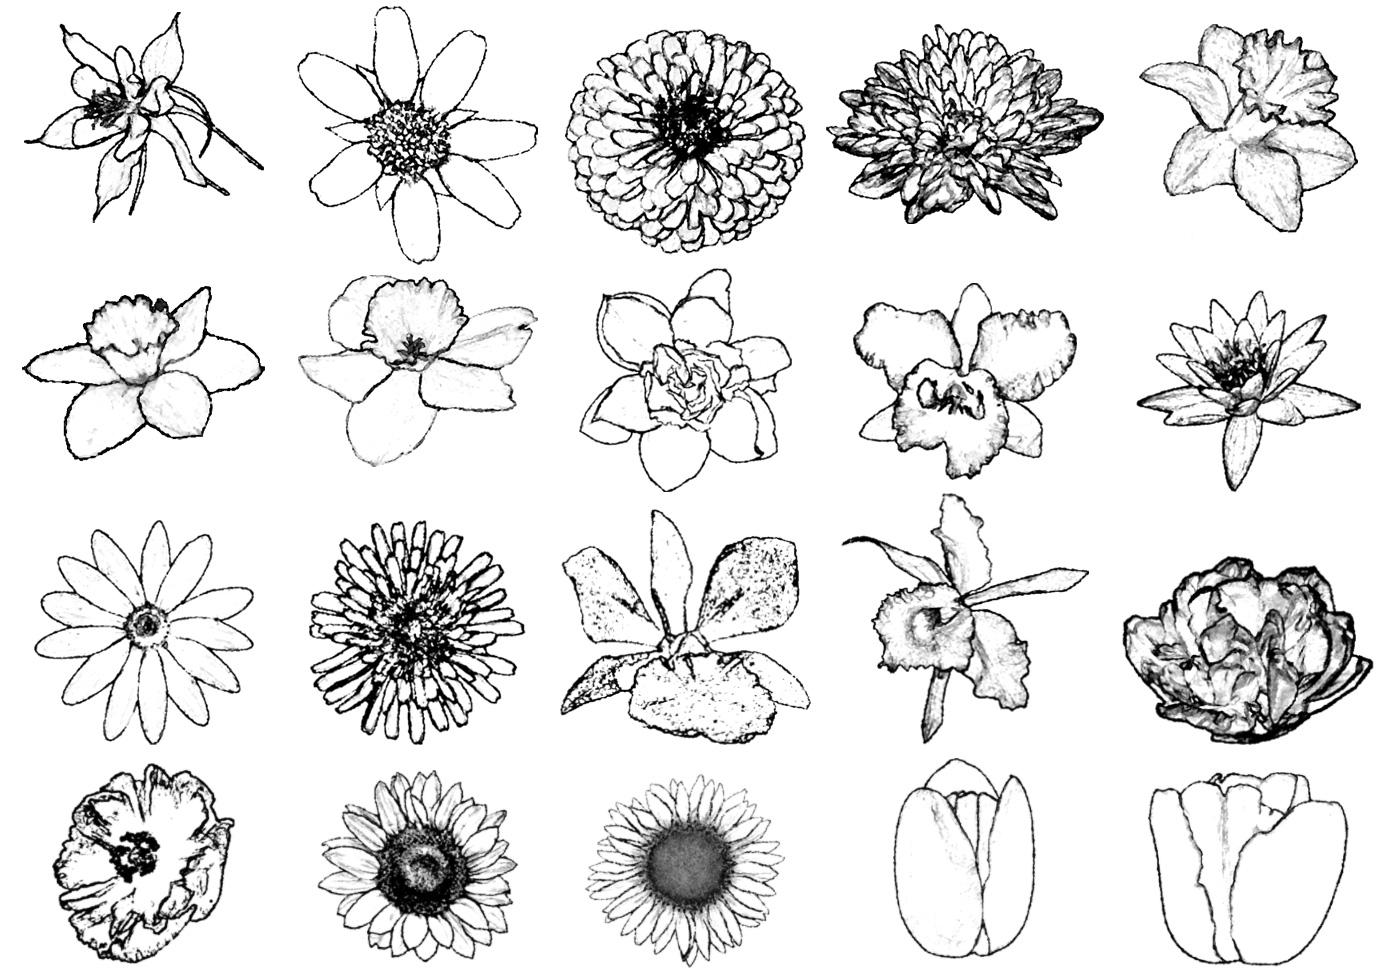 Ink Drawing Flower Brushes Free Photoshop Brushes At